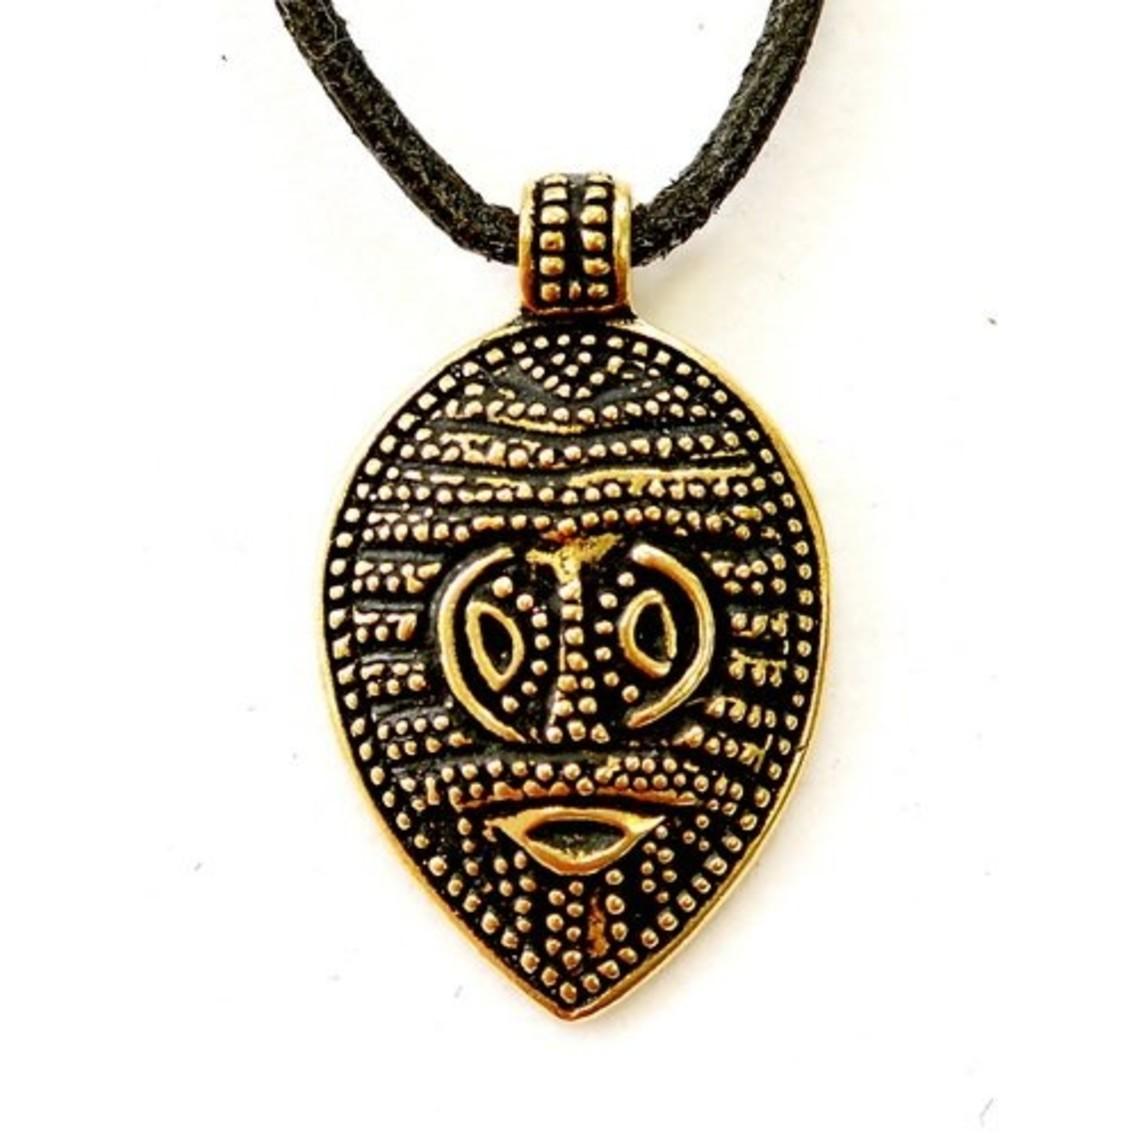 Vichingo amuleto maschera Gotland, bronzo